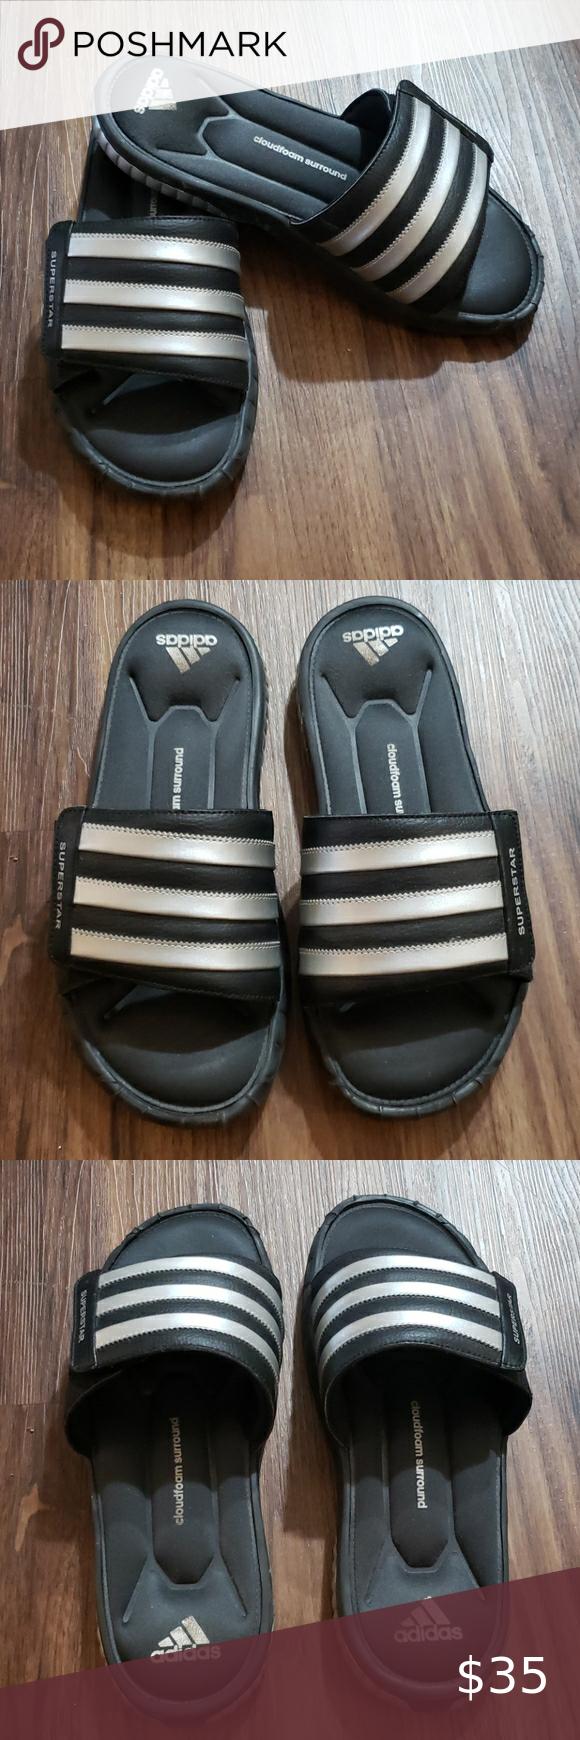 Adidas Superstar Cloudfoam Slides in